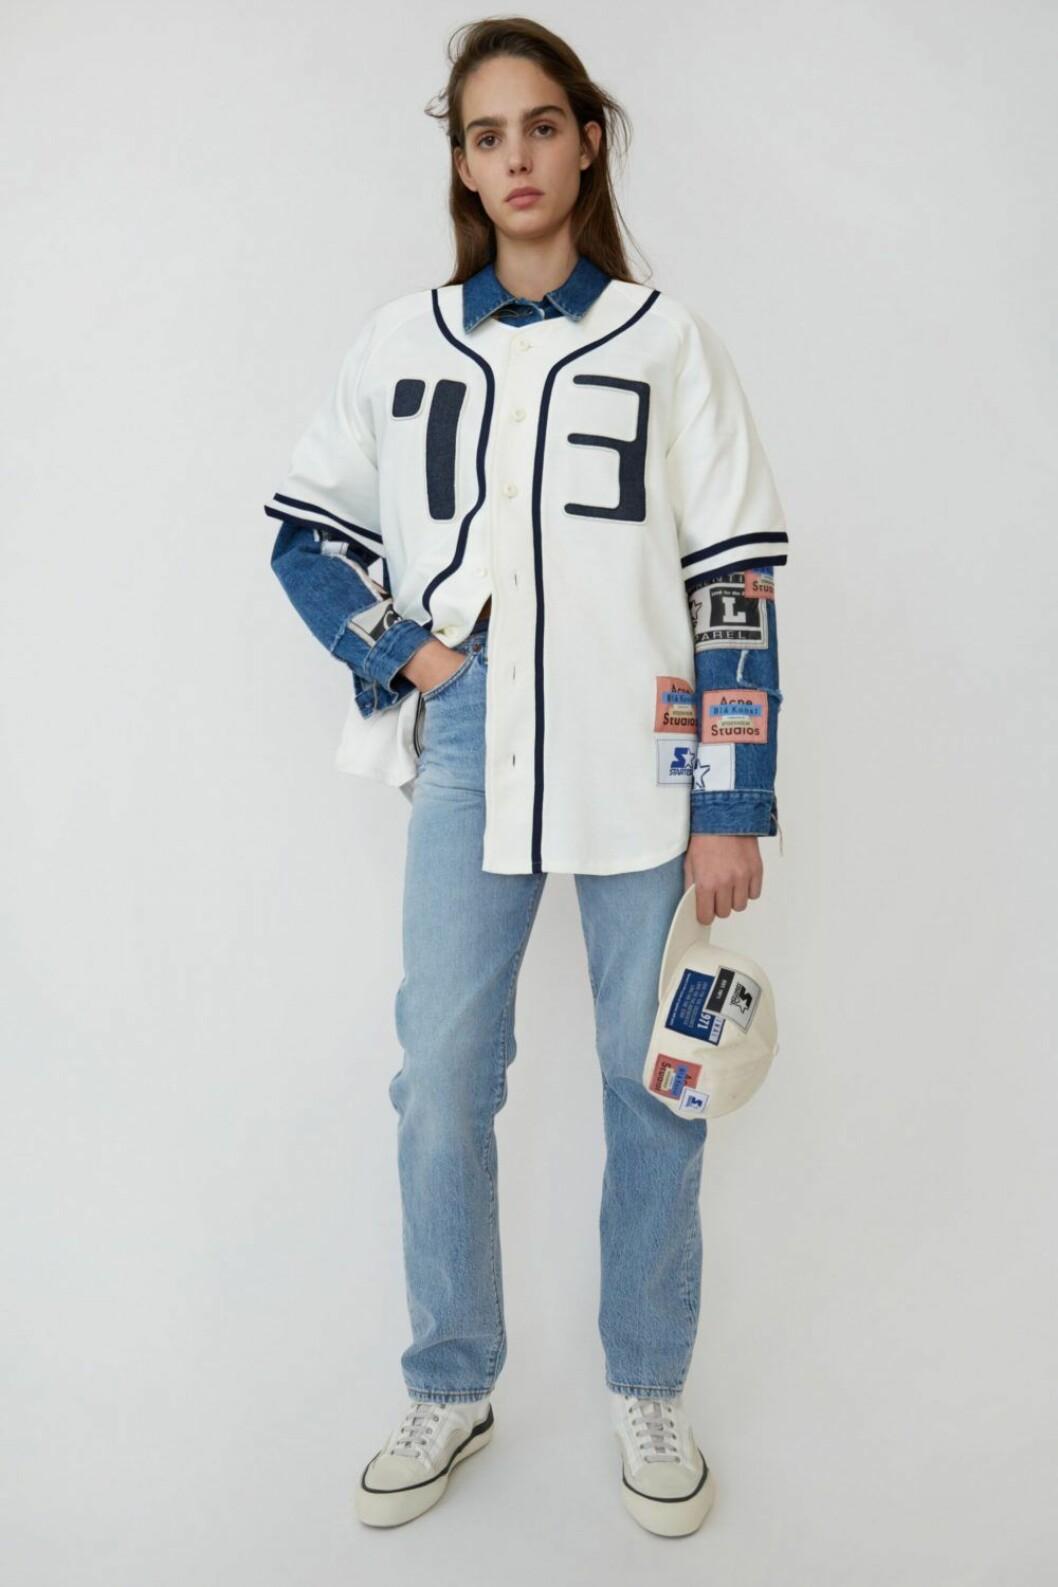 Jersery-tröja och jeans från Acne Studios x Starter.